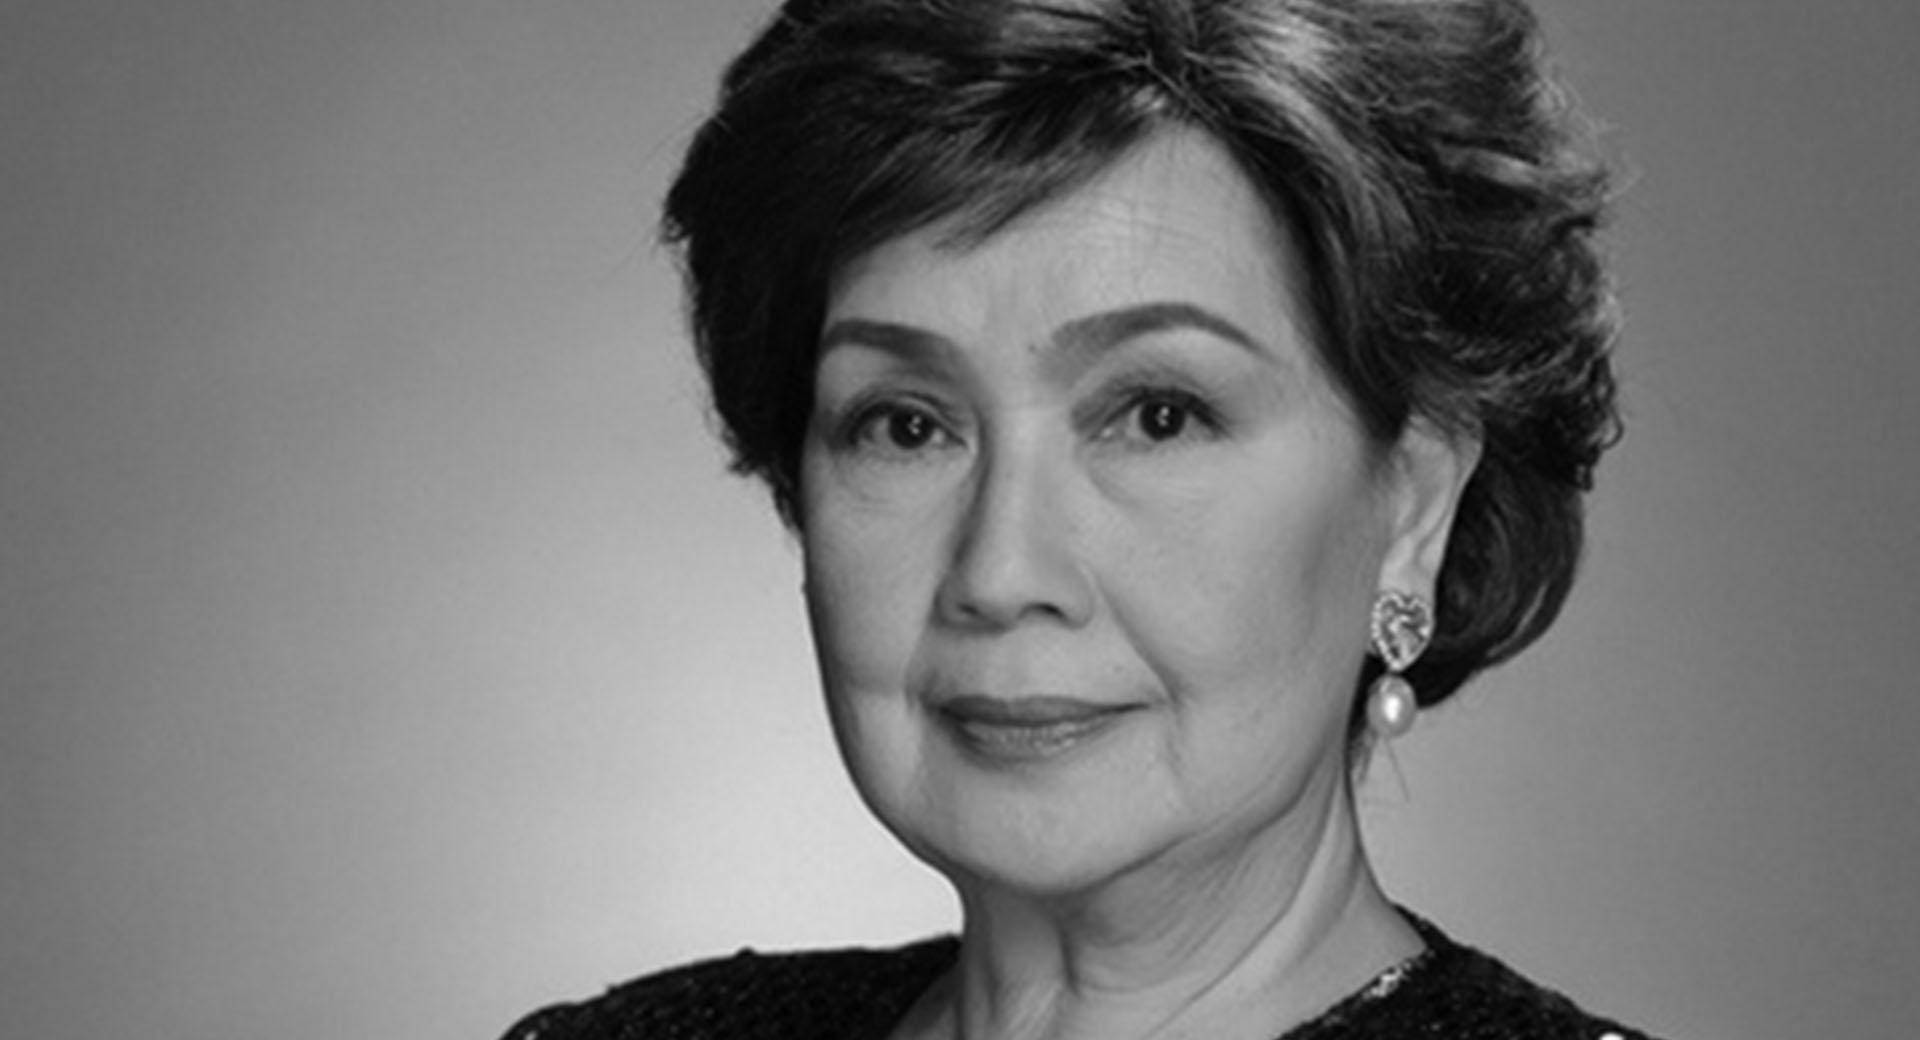 Ms. Susan Roces-Poe